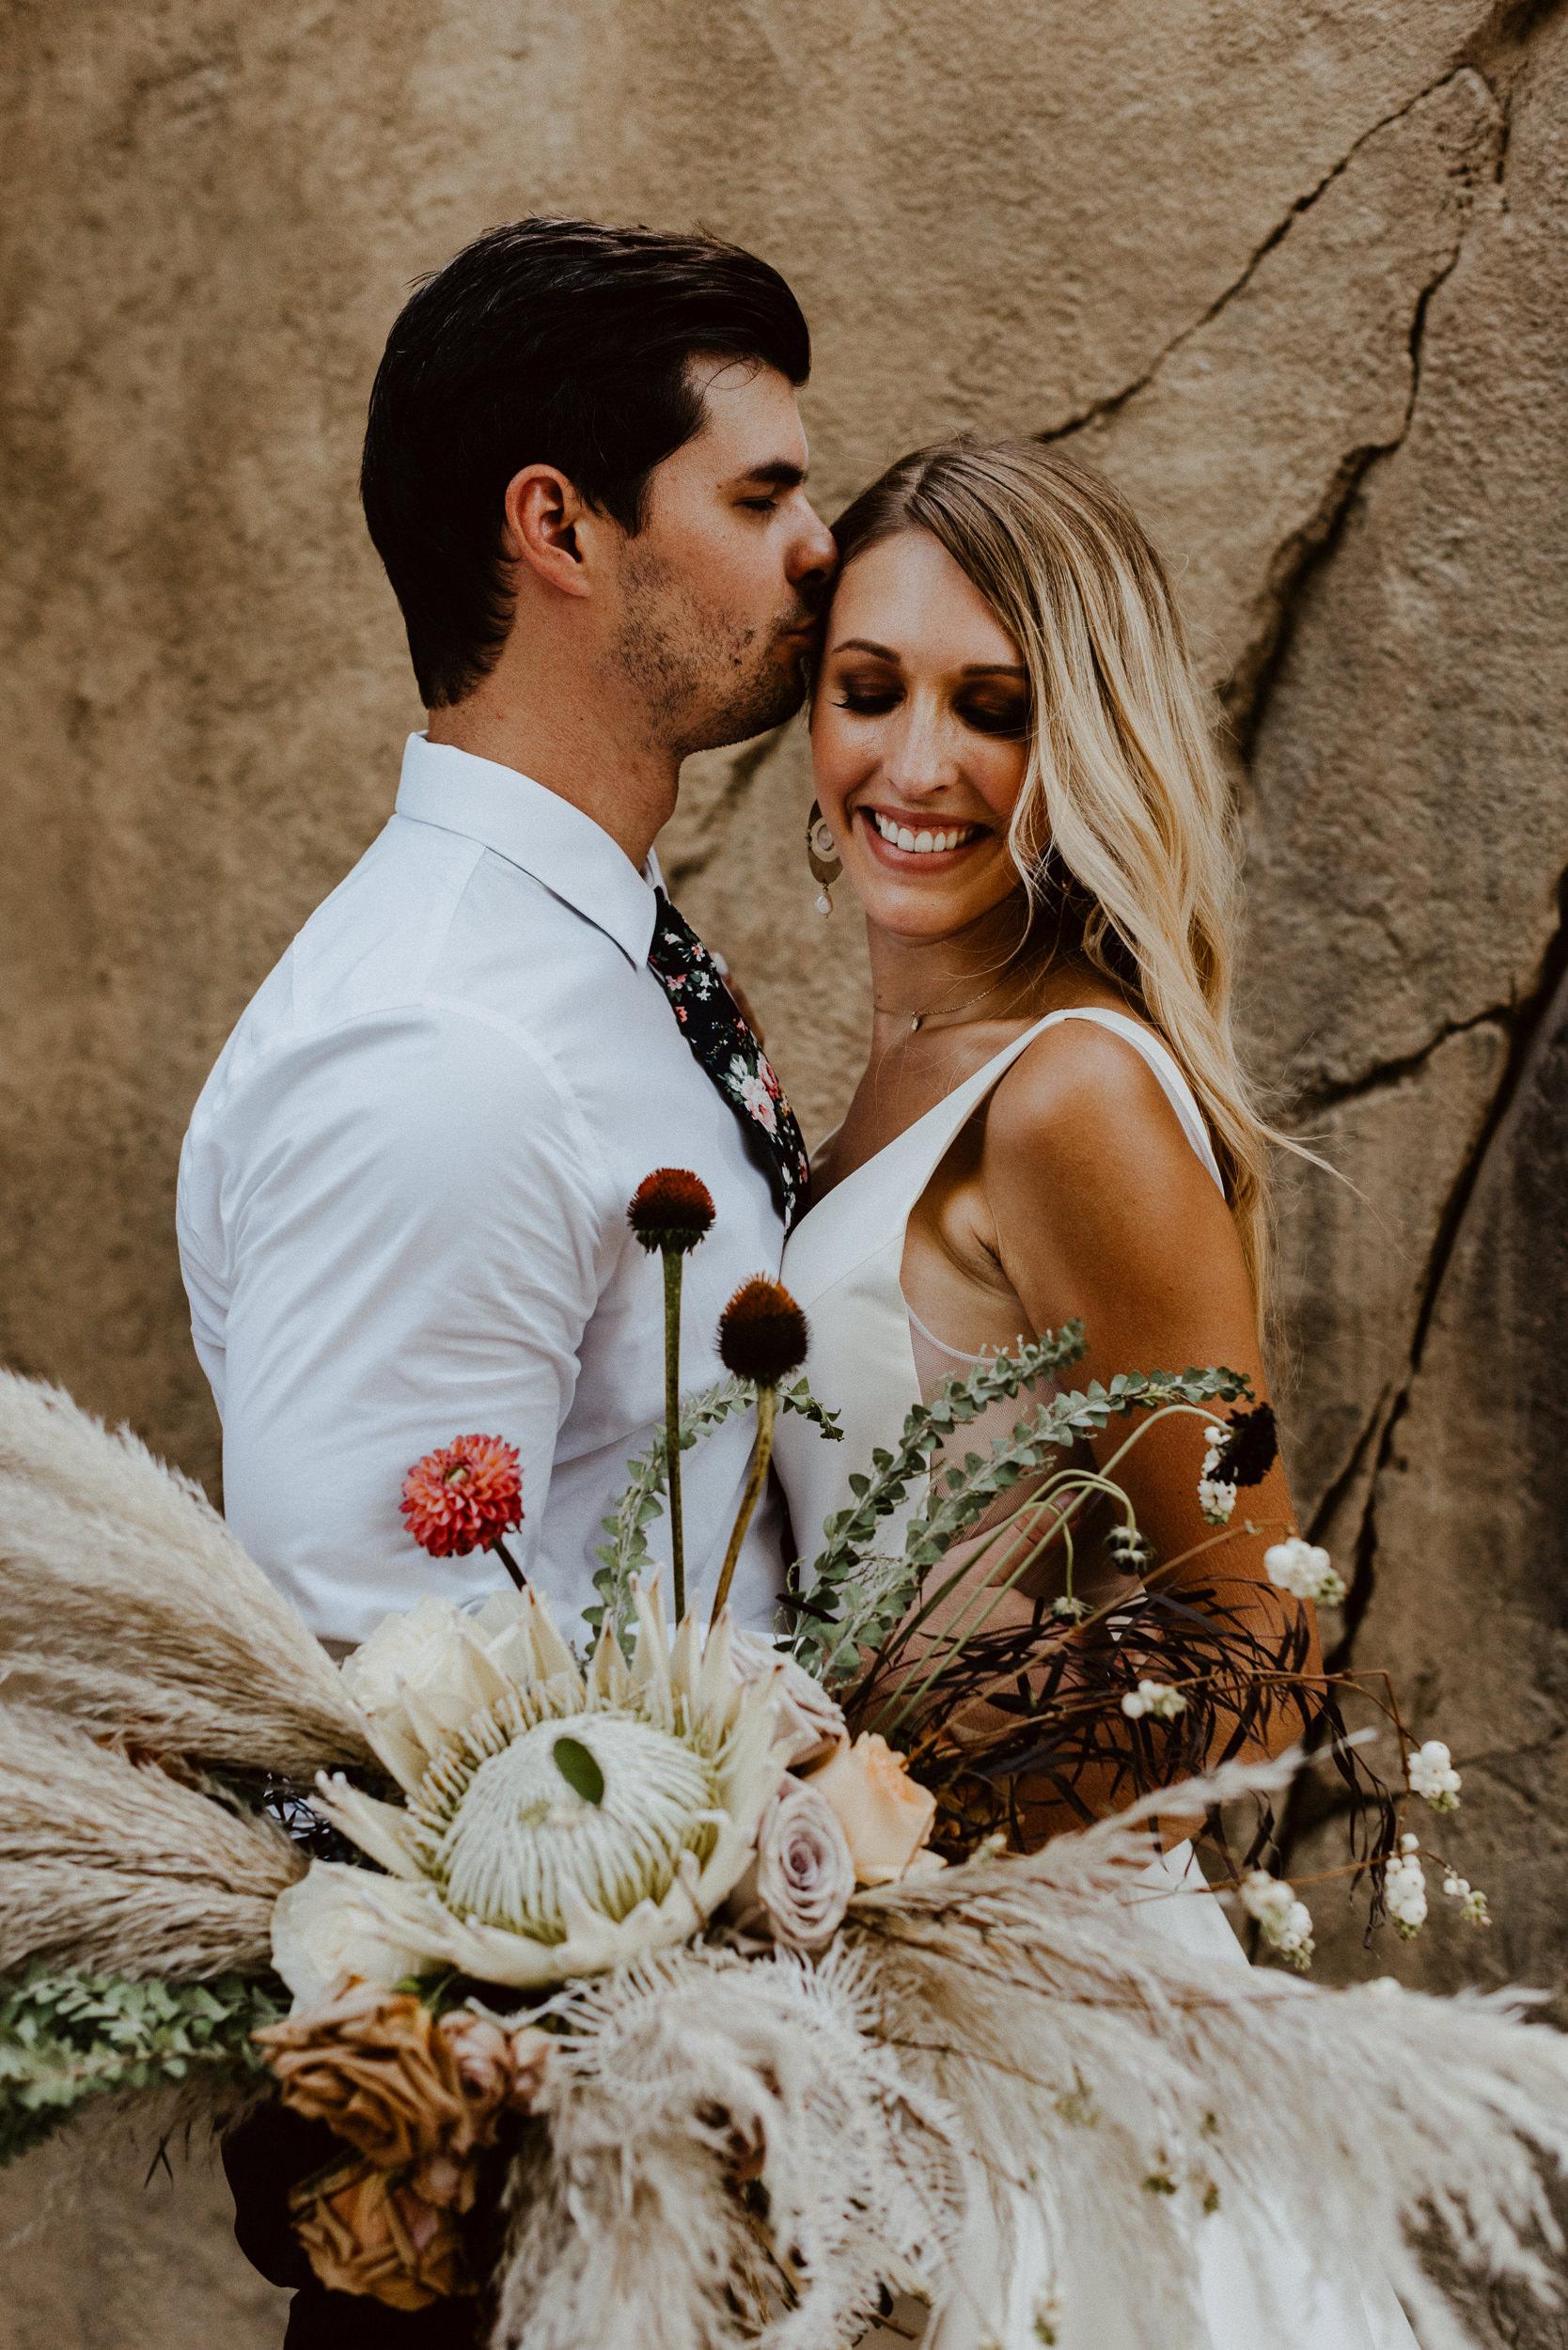 sChelsie + Chris - The Desert Shootout Wedding Romantics at The Living Desert-119.jpg